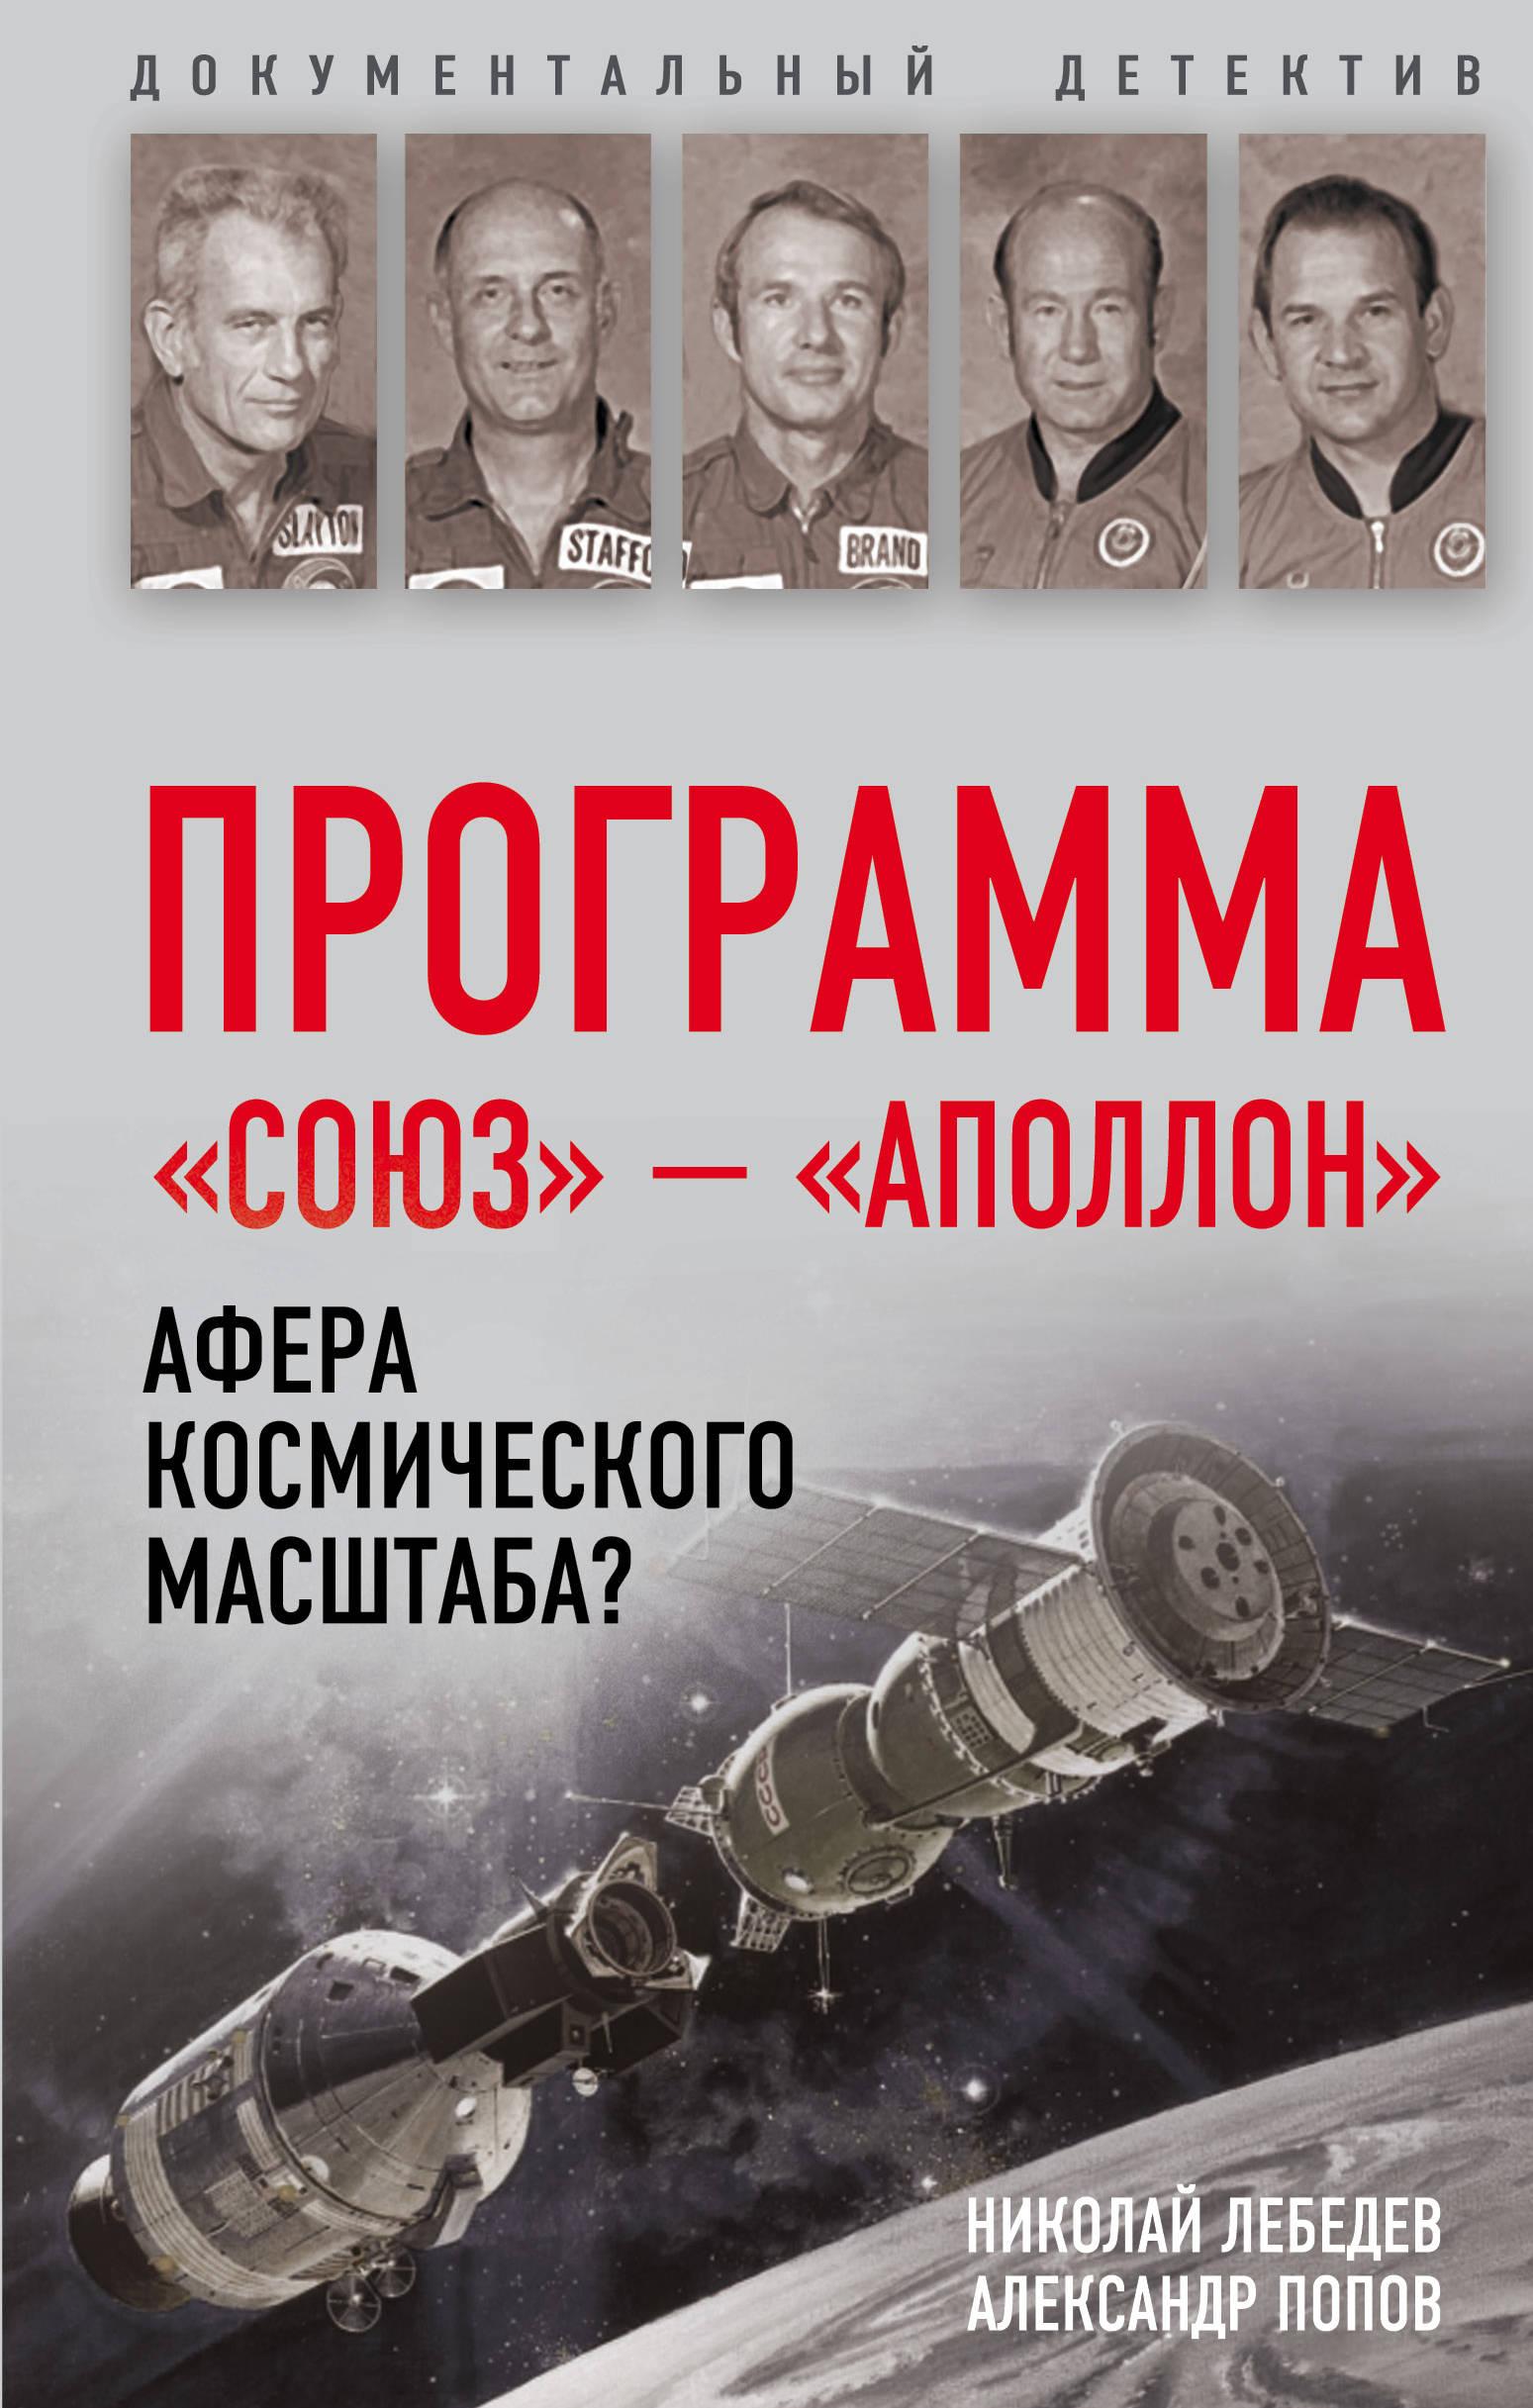 Лебедев Николай Викторович; Попов Александр Иванович Программа «Союз — Аполлон»: афера космического масштаба?